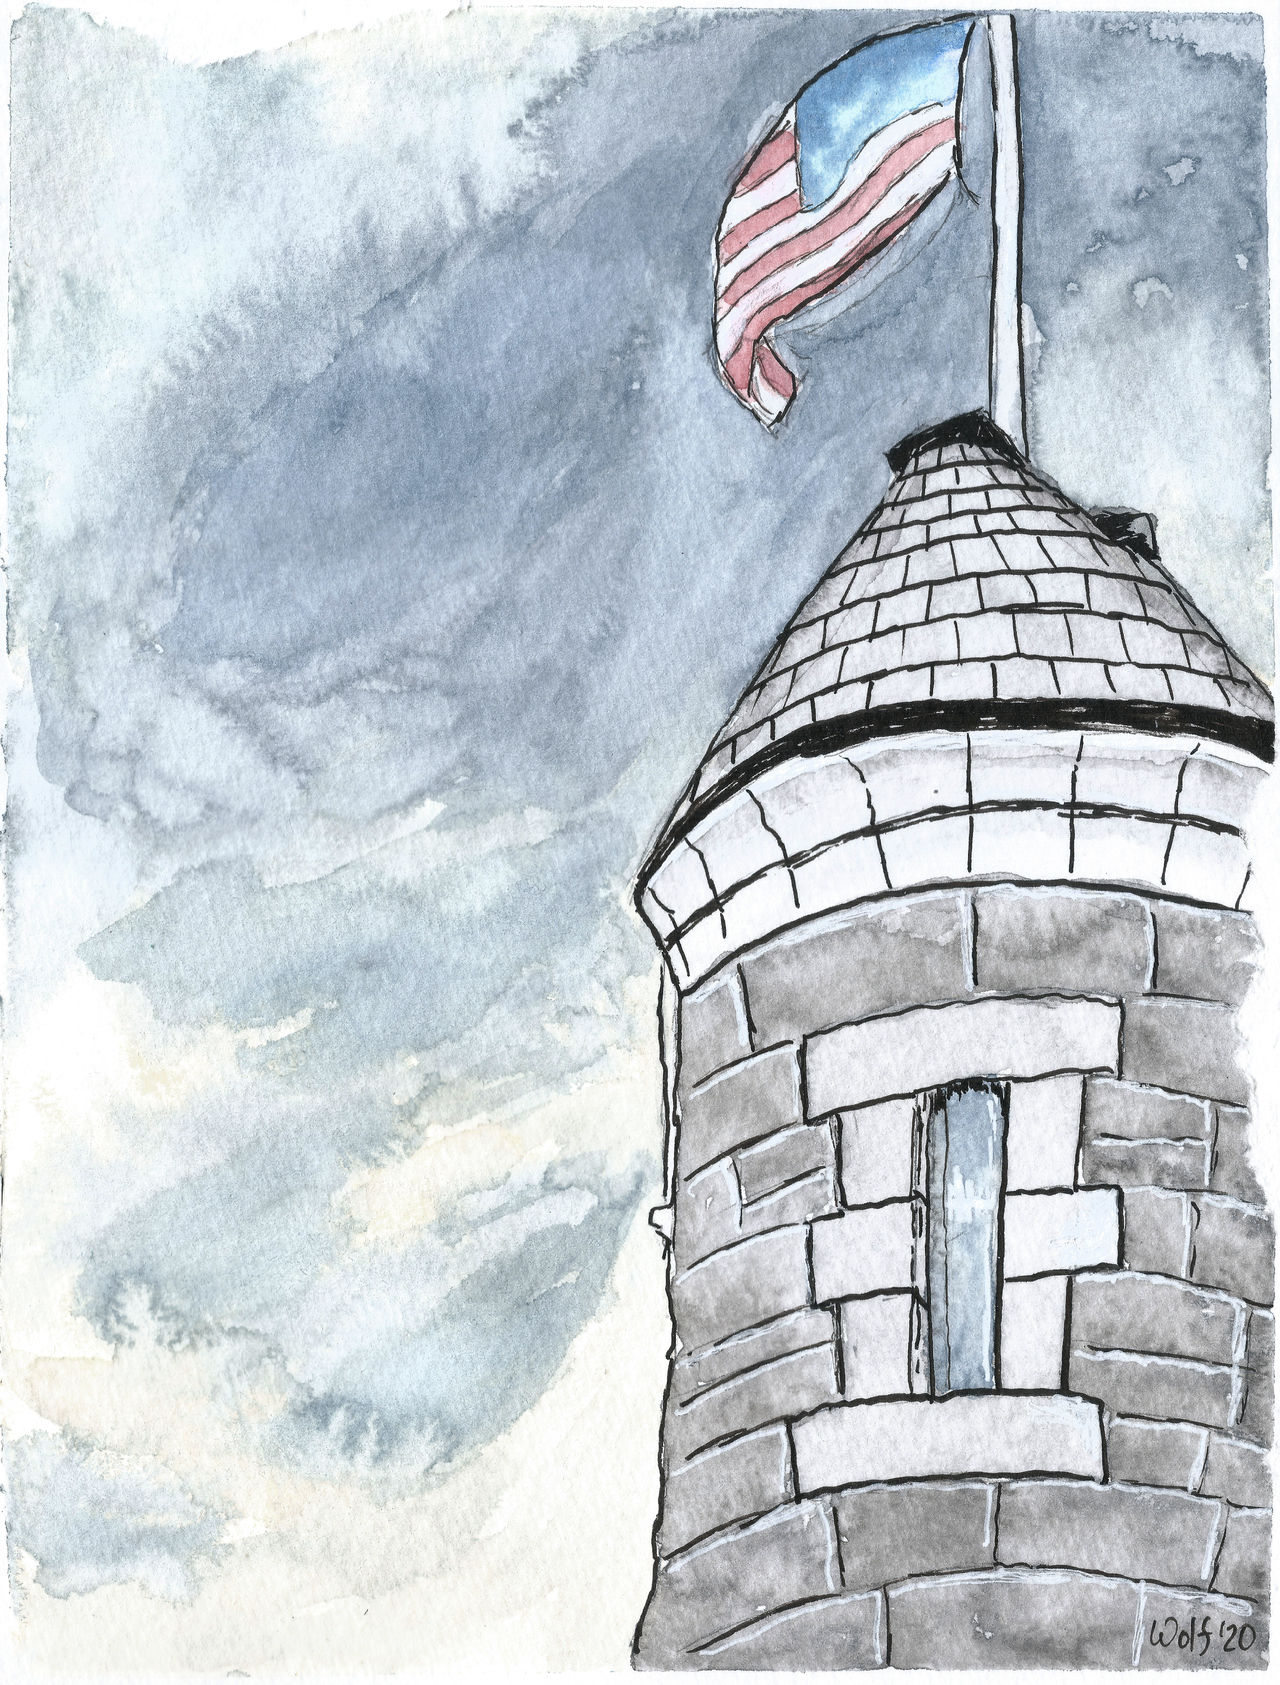 Inktober 52 2020 #11: Tower